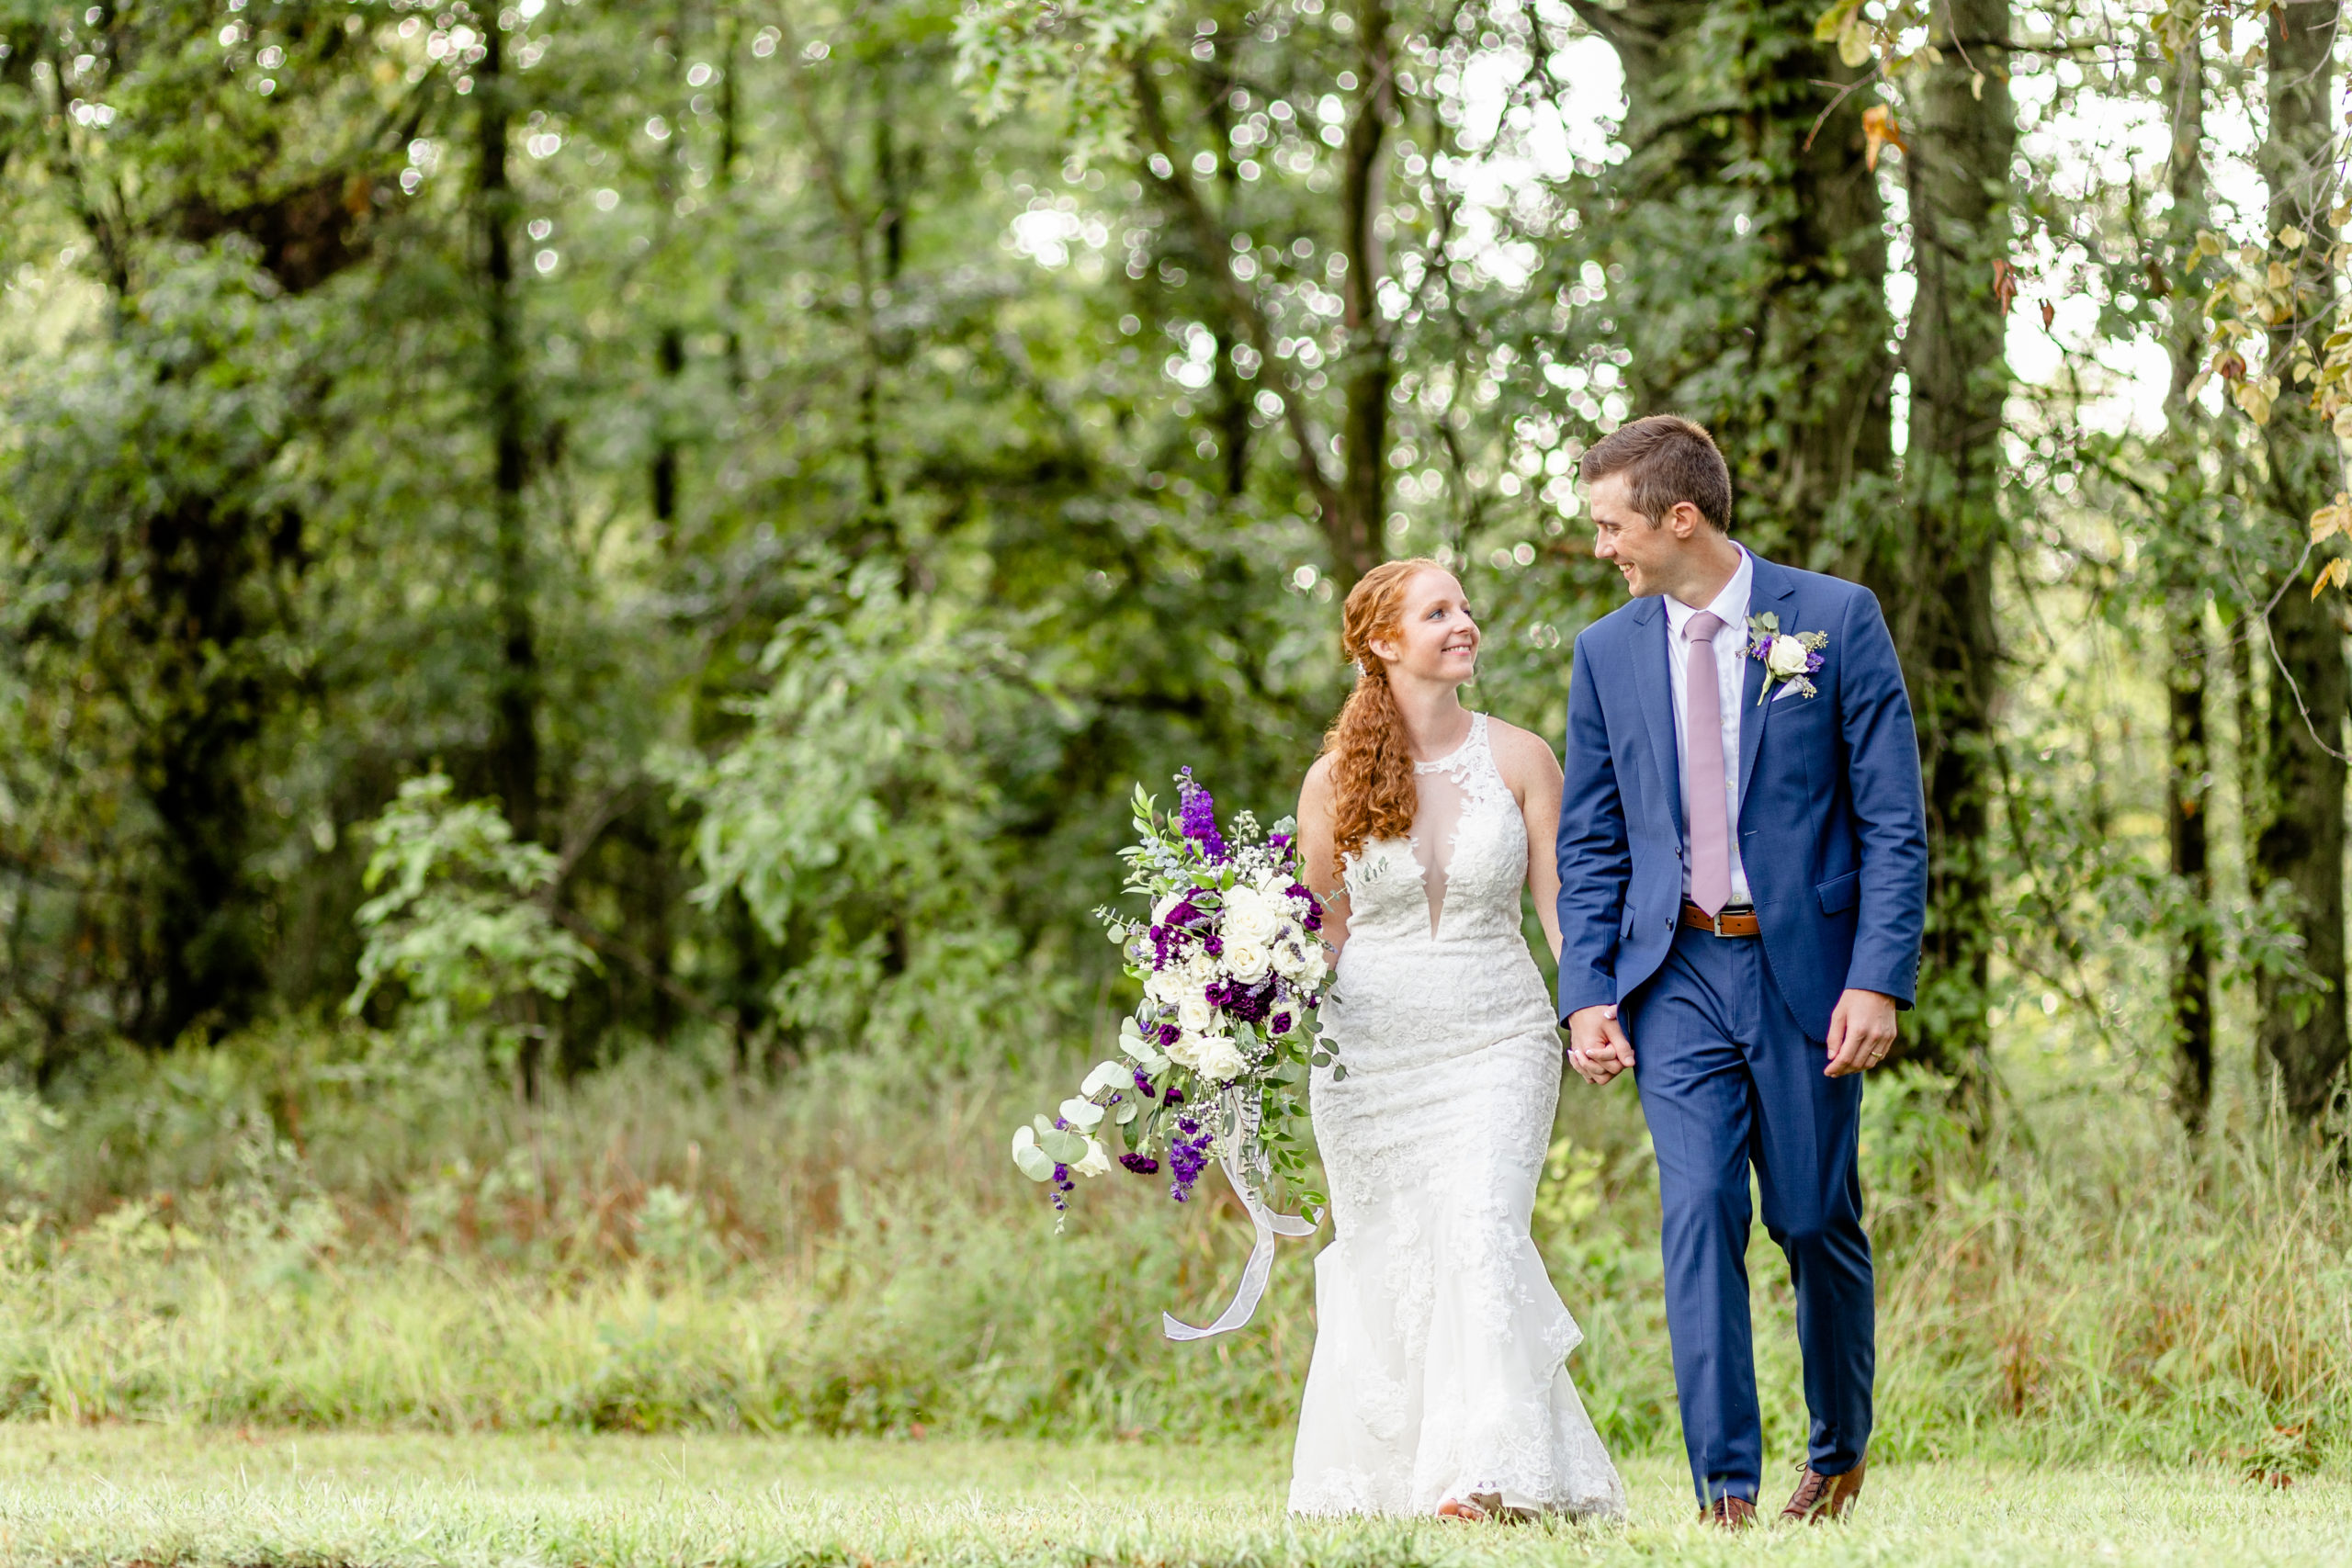 wedding photography, summer romance wedding, purple wedding accents, southern illinois wedding photography, walking bride and groom, woodland romance, woodland wedding, and blue wedding